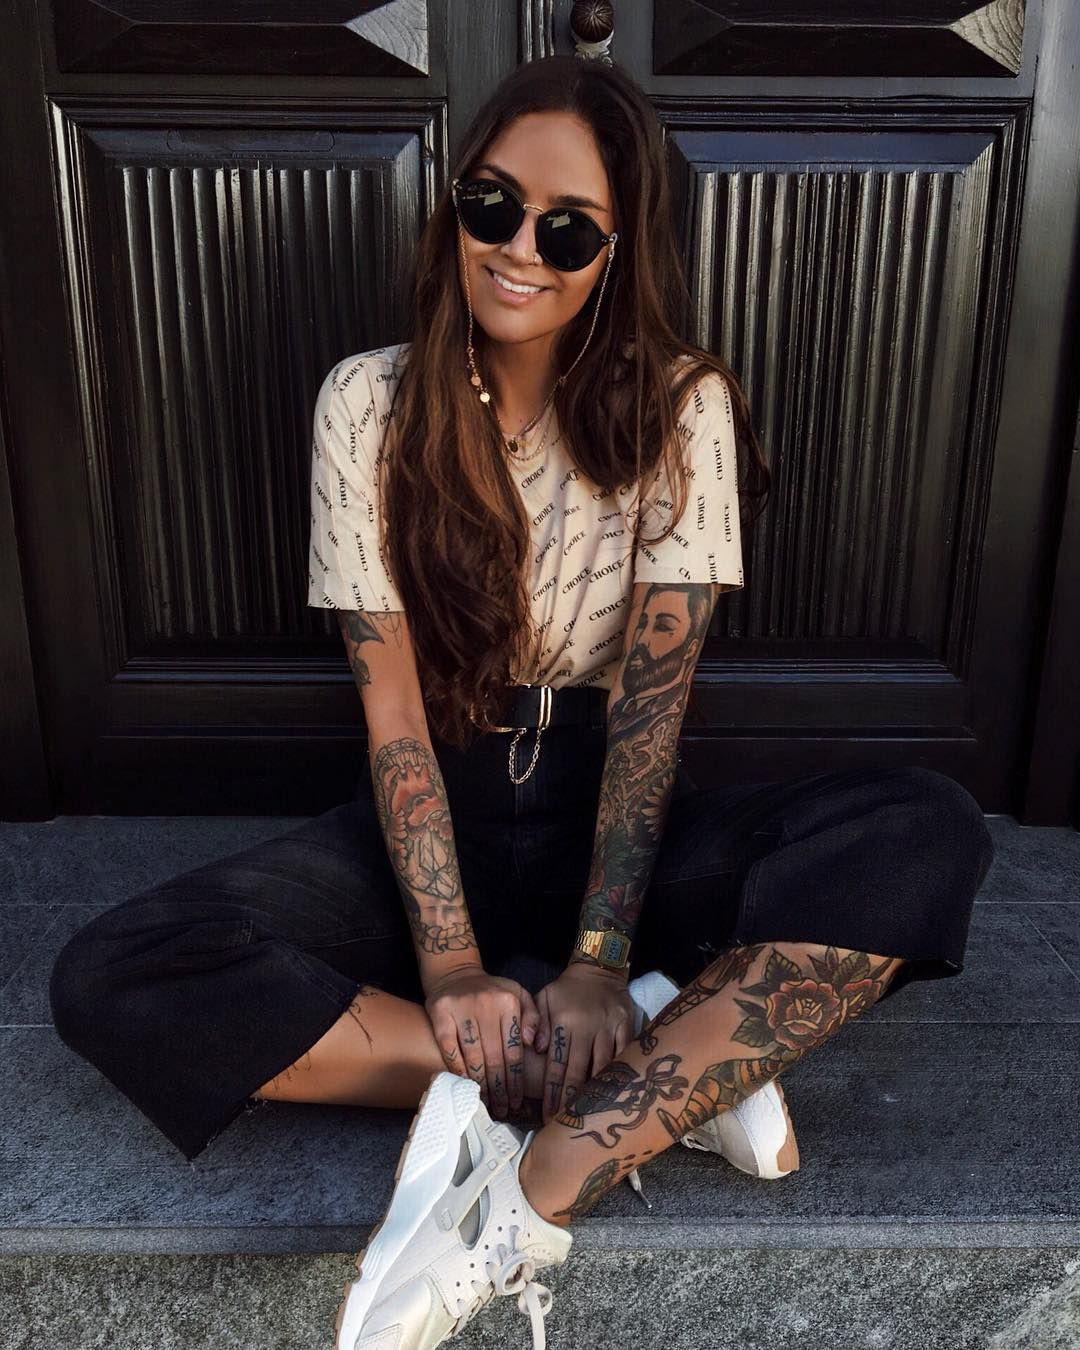 Michellechristyn Tattoos Tattoogirl Grunge Grungegirl Tumblr Boots Tattoo Hair Trainers Sunglasses Fashion Ootd Inspo Fa Grunge Mein Style Ootd